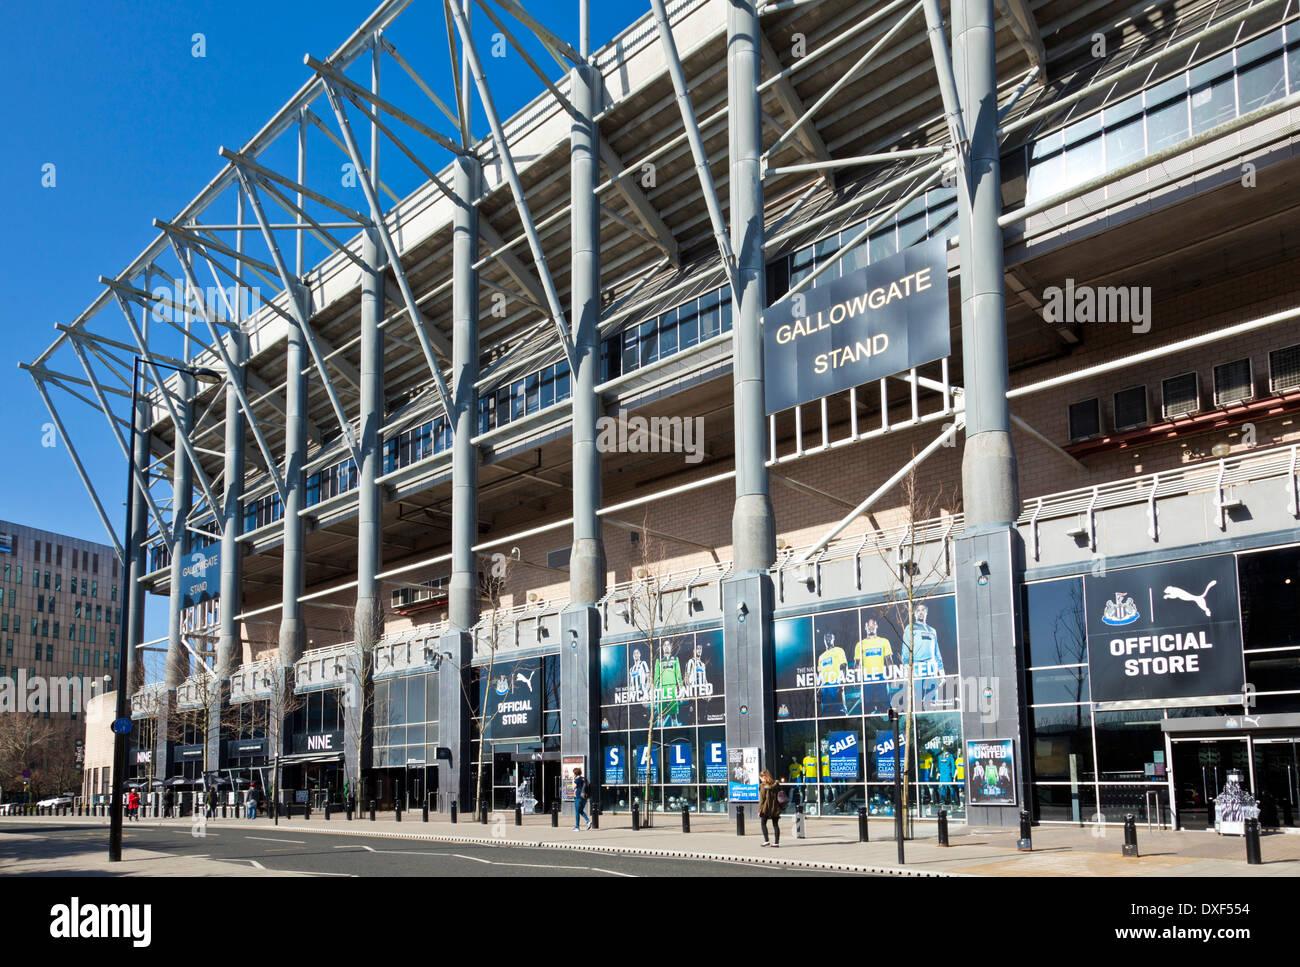 St James' Park Fußball Stadion Heimat von Newcastle United Football Club Newcastle Upon Tyne Tyneside England gb uk EU-Europa Stockbild